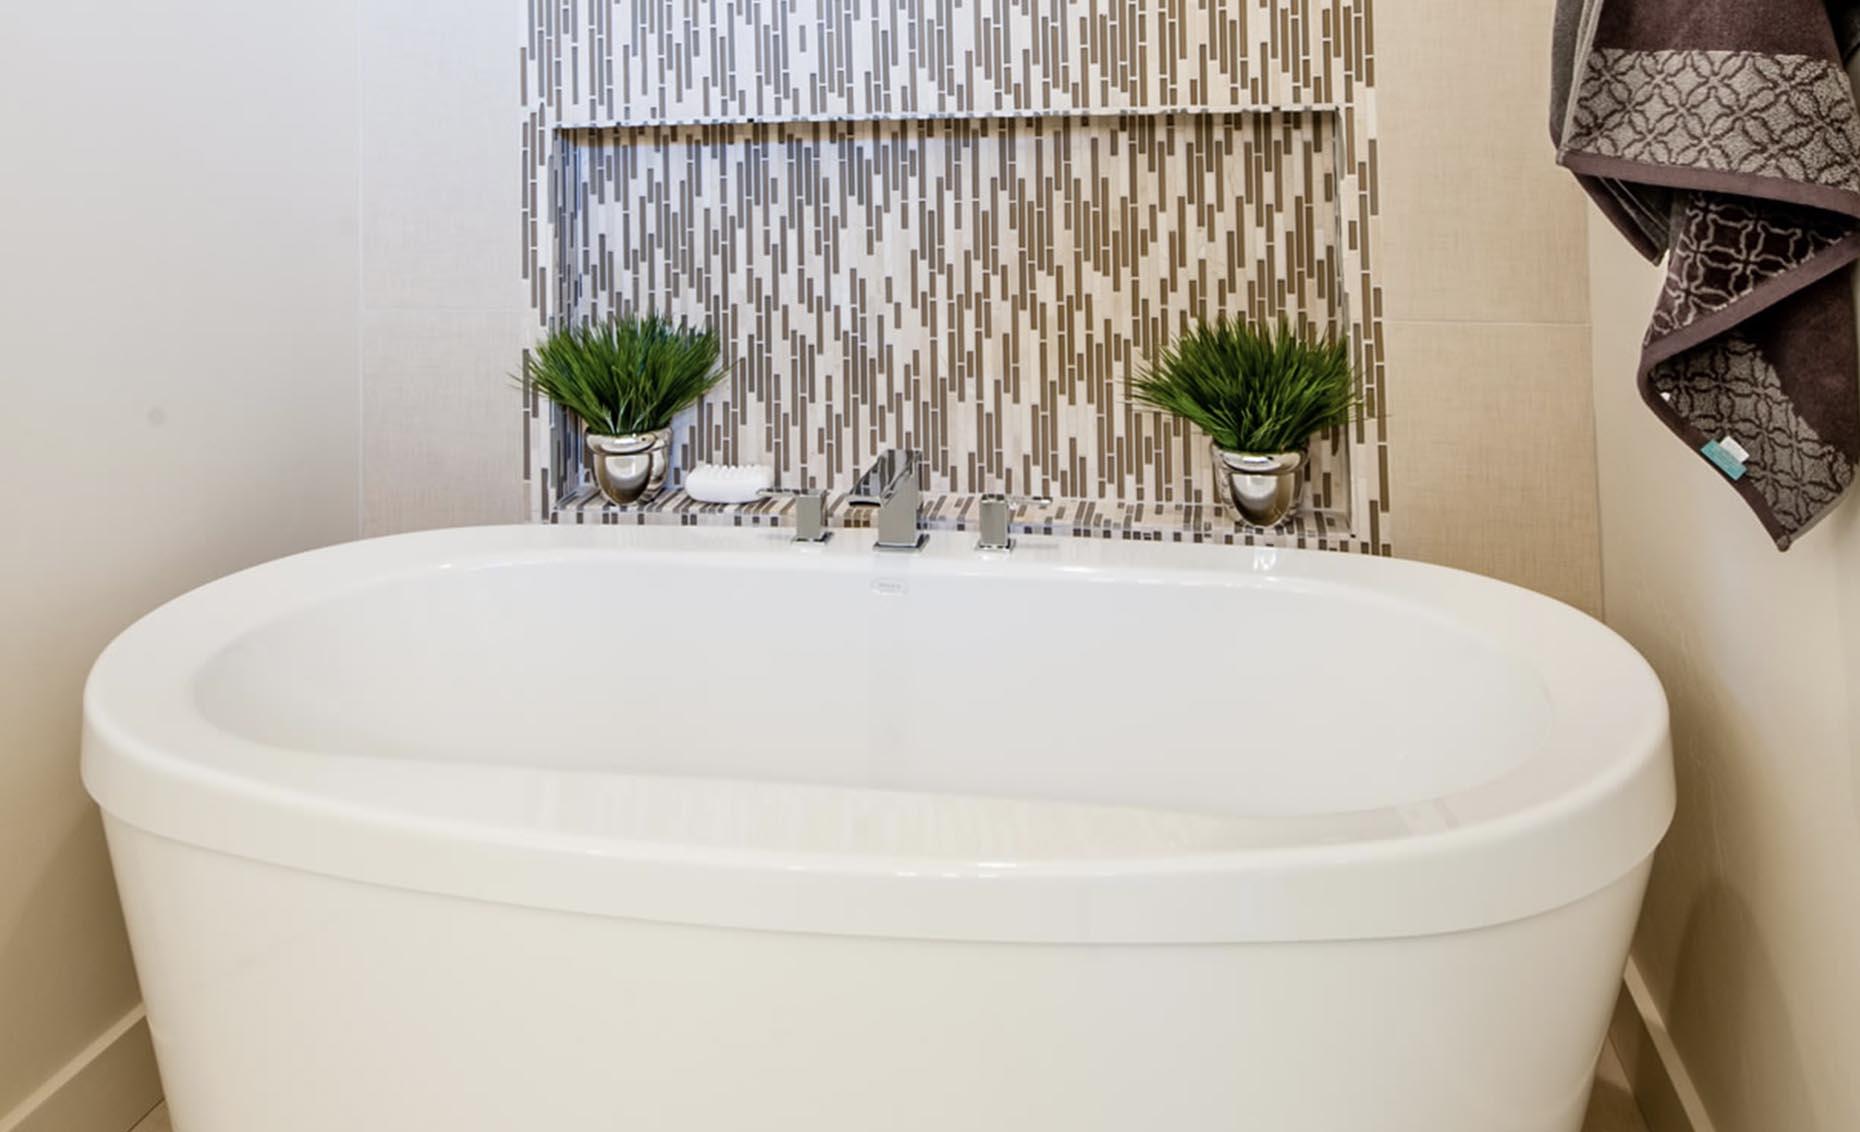 The Contemporary House Master Bathroom Bath Tub